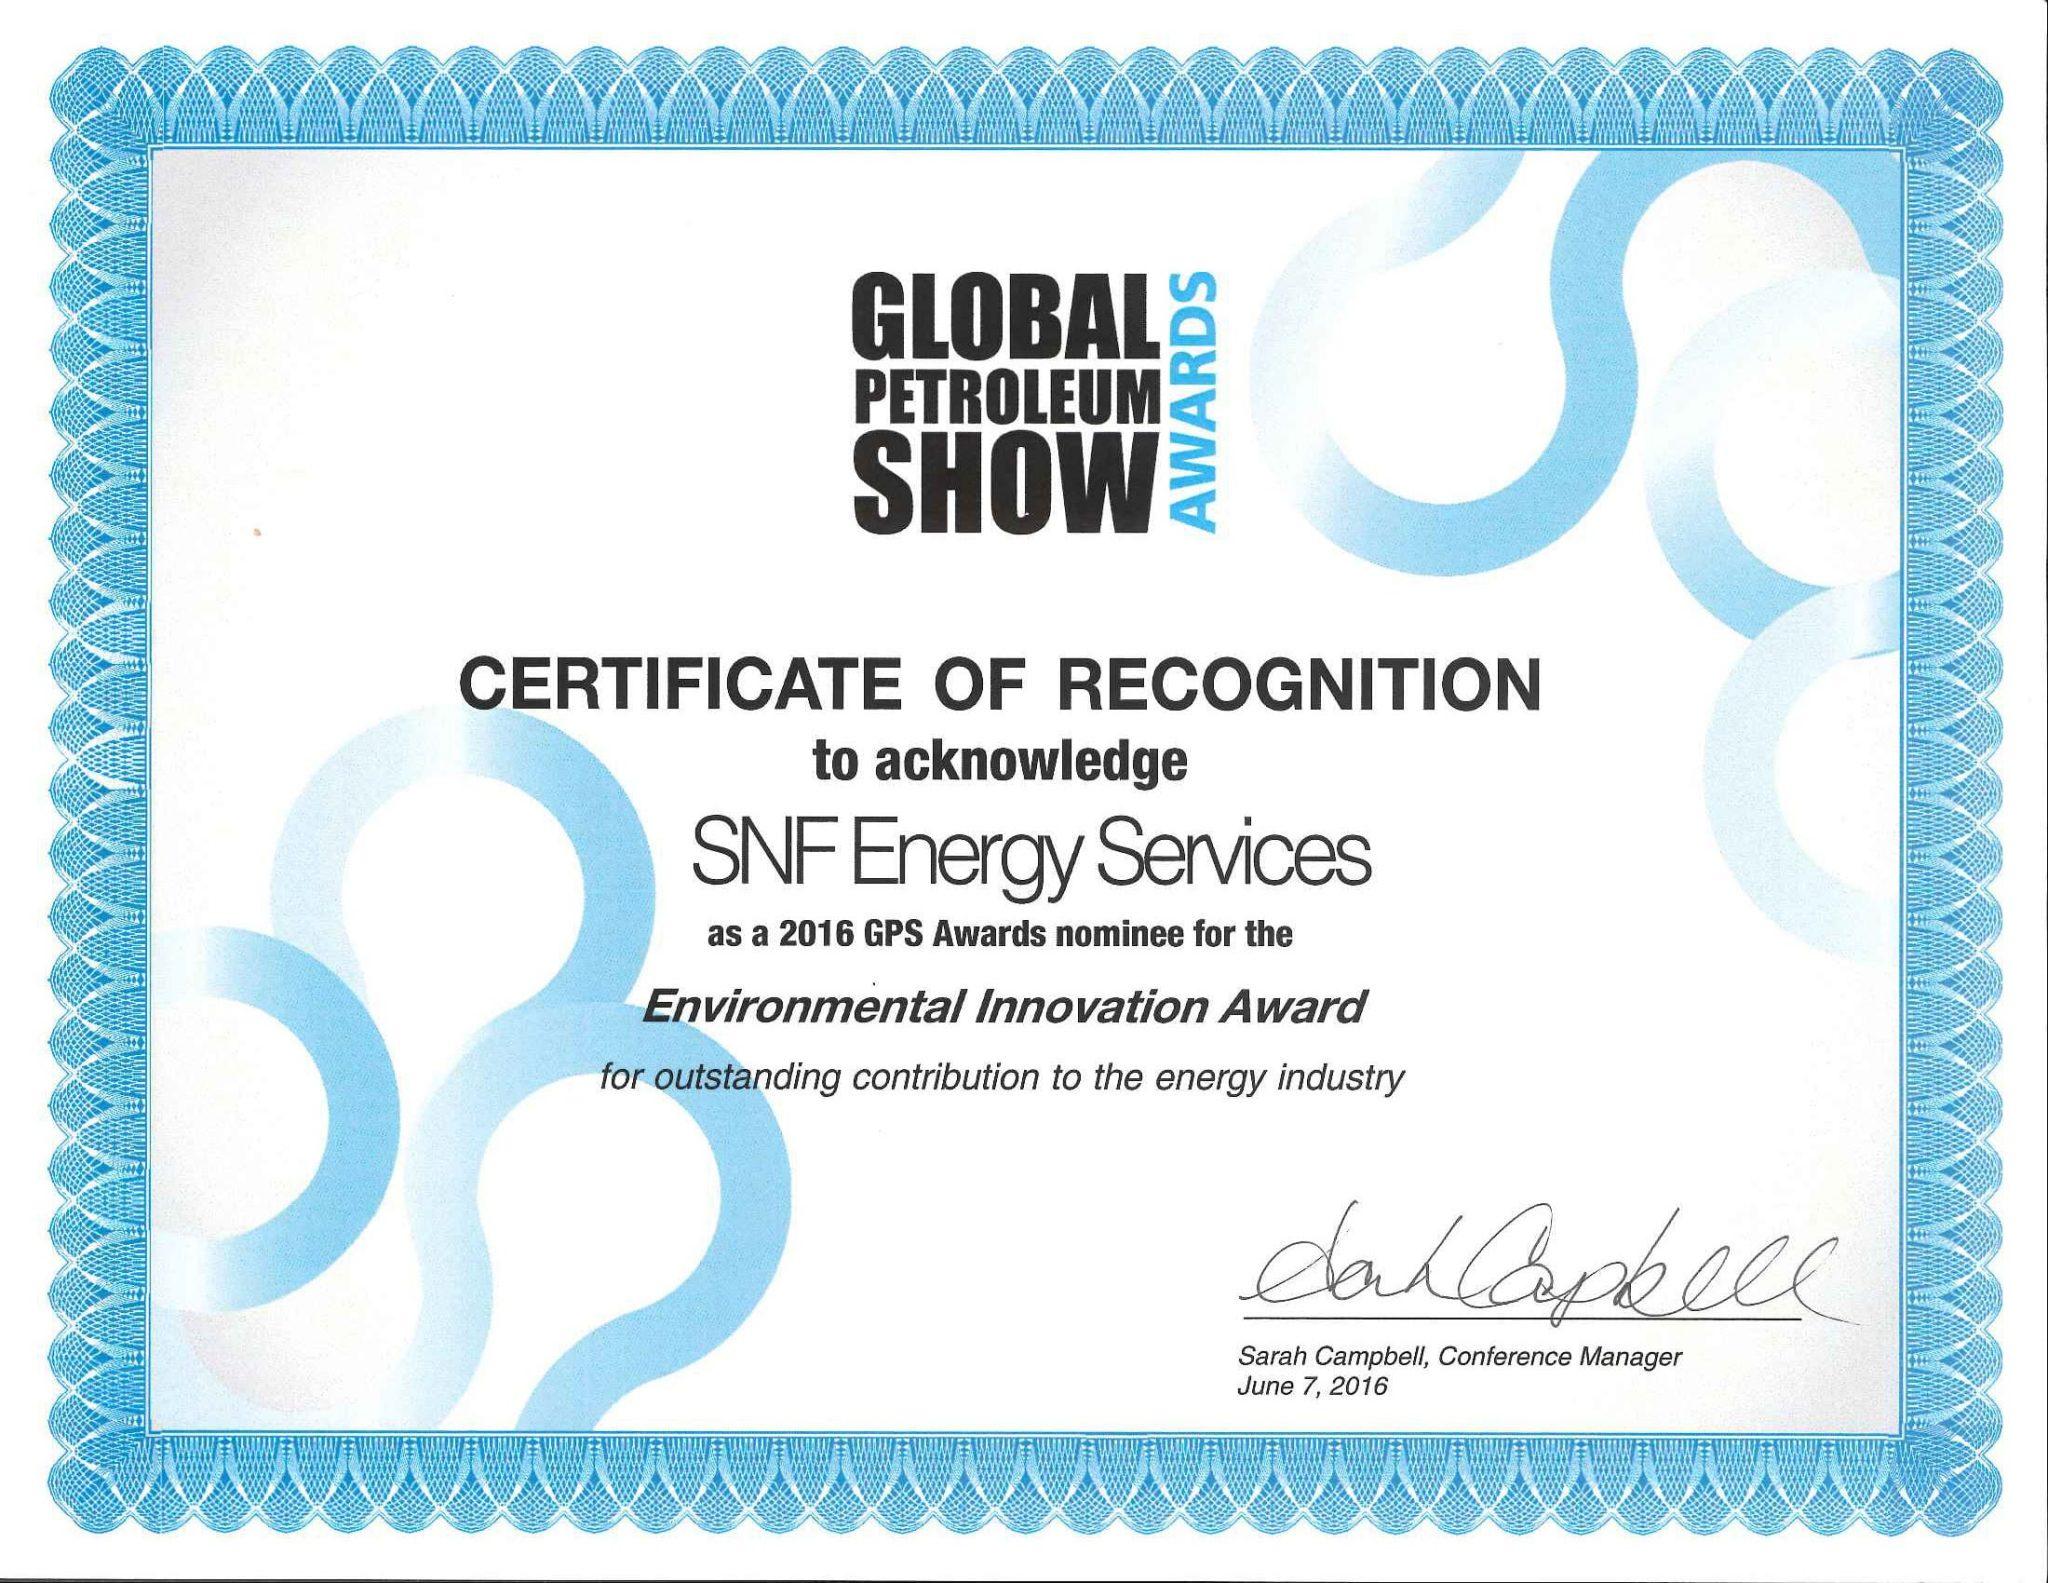 SNF ENV innov Award Certificate